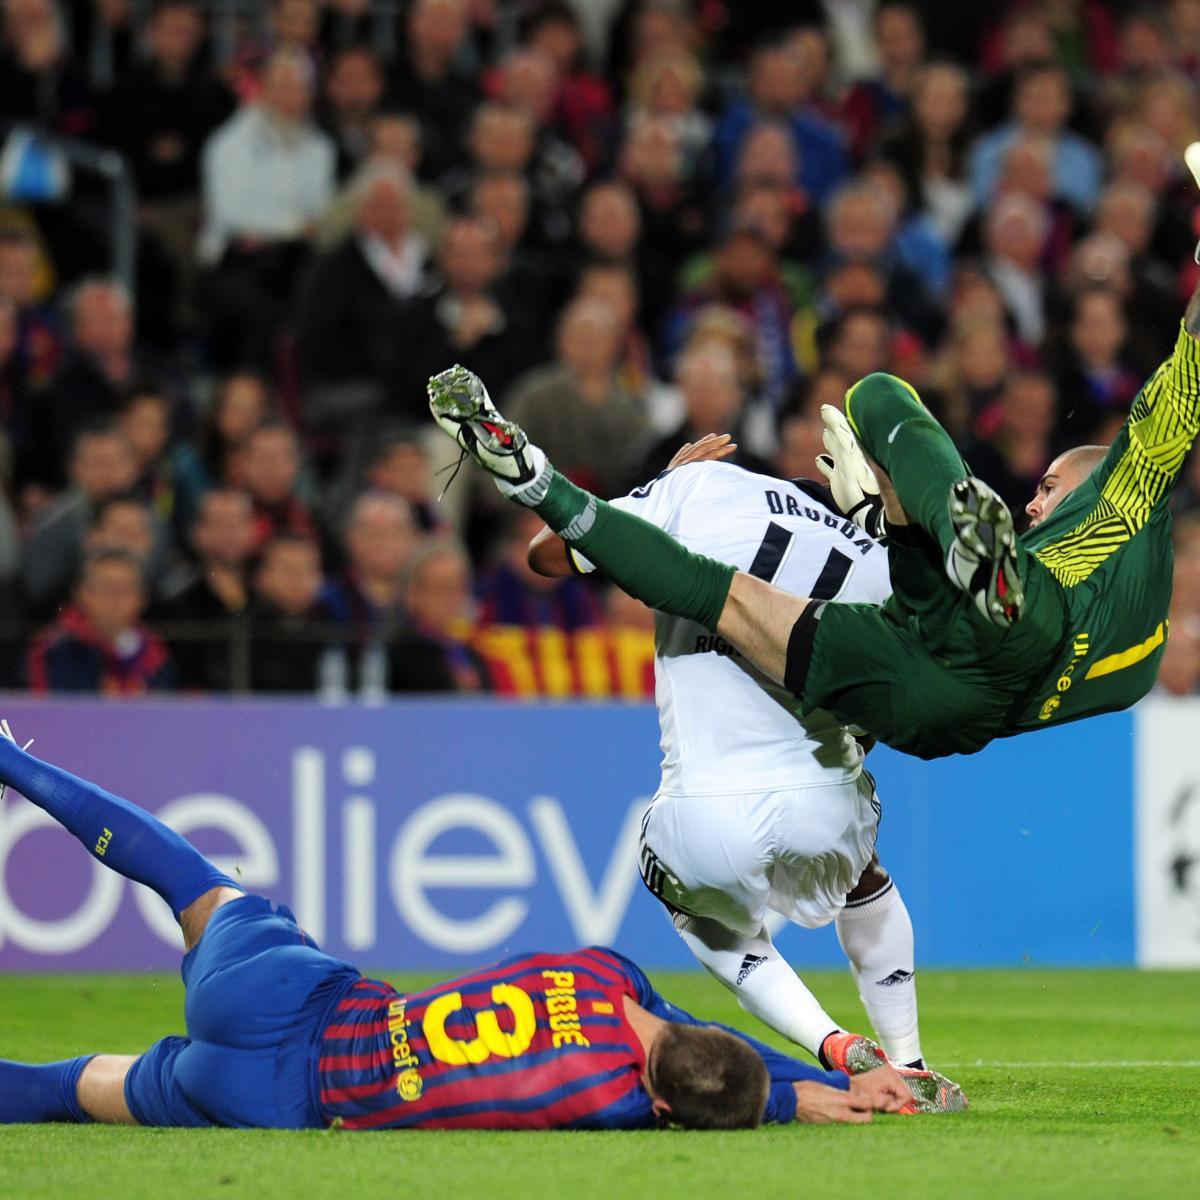 Arsenal Vs Barcelona Live Score Highlights From: Chelsea Vs Barcelona Live: Scores, Highlights And Player